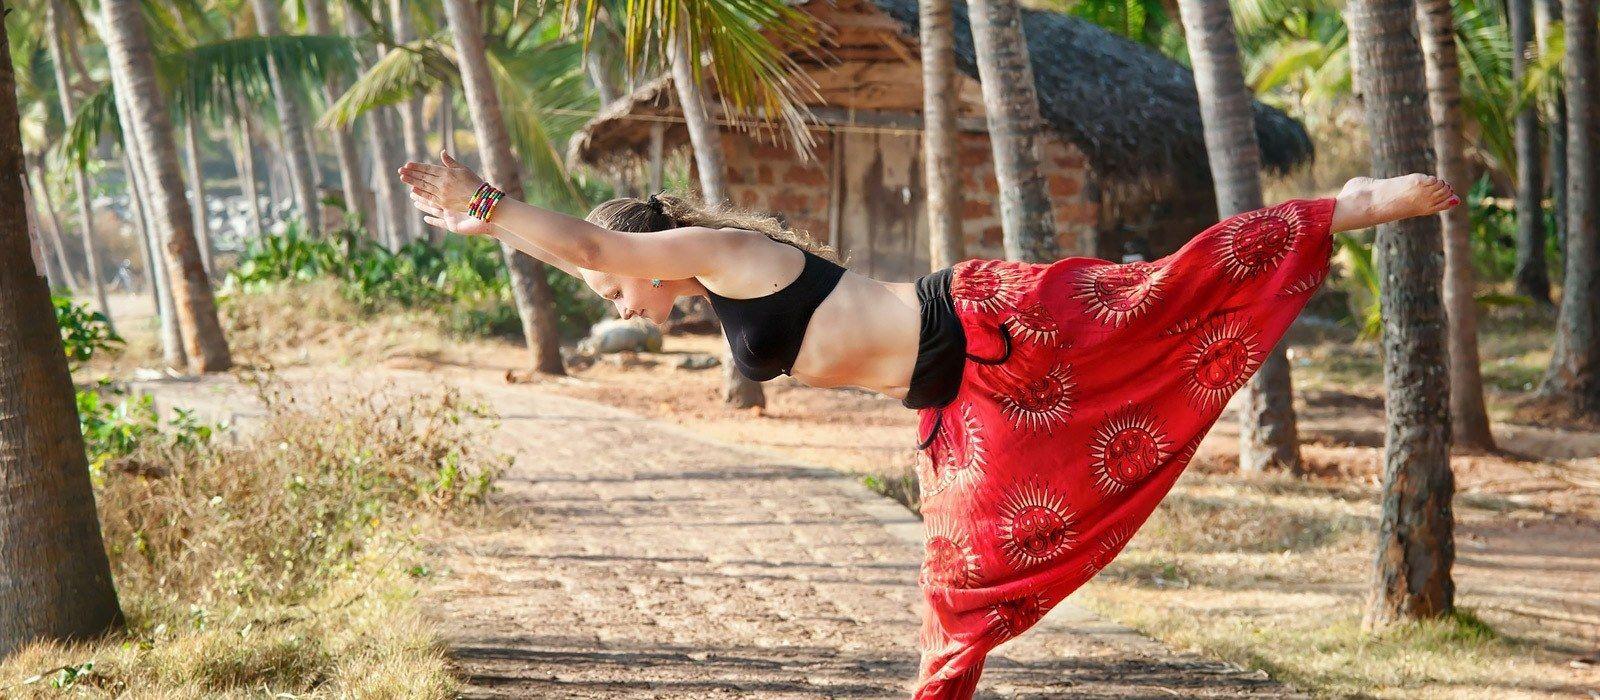 Spiritual and Symbolic India Tour Trip 1